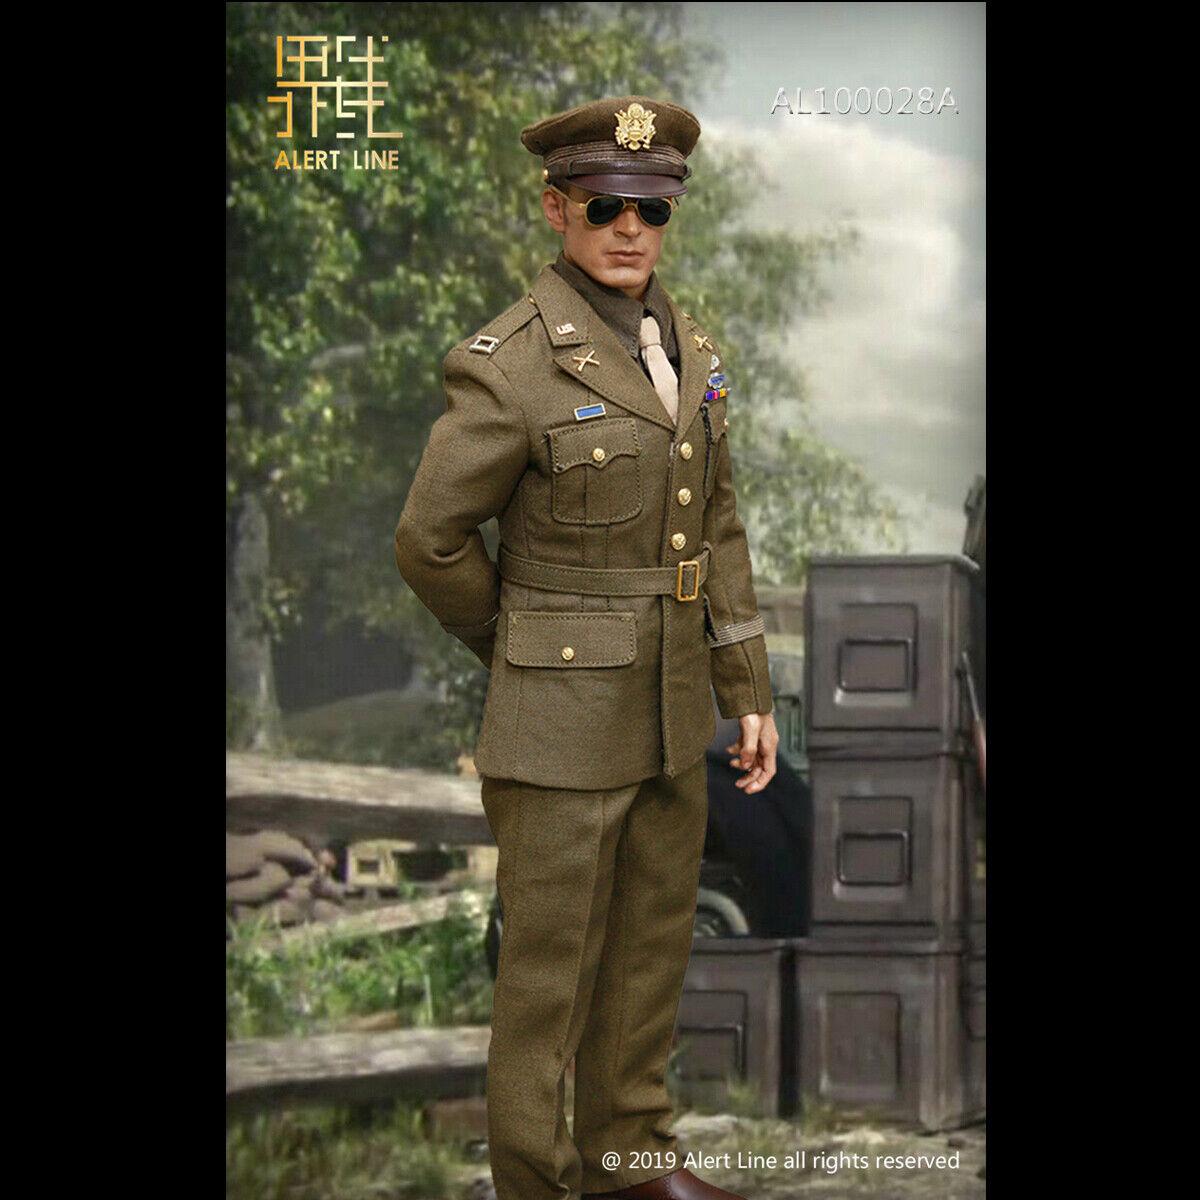 Lert Line  AL100028 1 6 WWII U.S.Army Officer Uniform Suit A  For 12 Action Fig